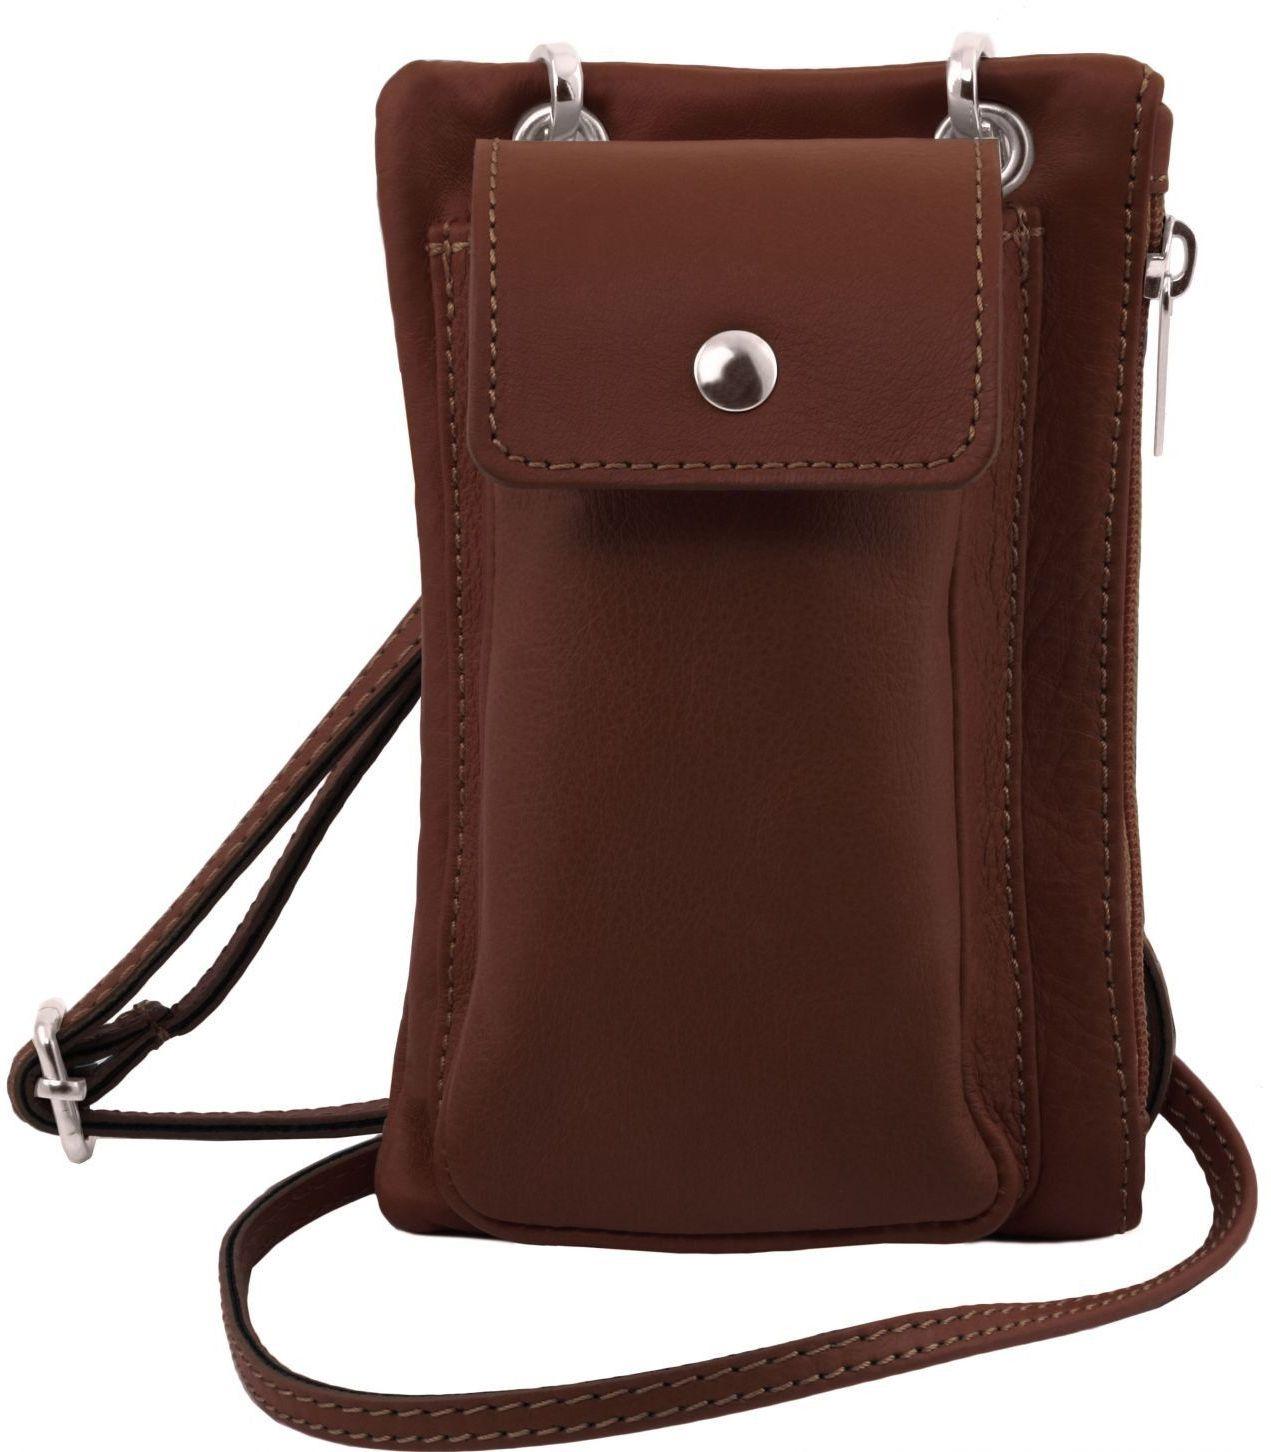 Unisex Τσαντάκι Δερμάτινο Mini Cross TL141423 Καφέ Tuscany Leather γυναίκα   τσάντες ώμου   χειρός